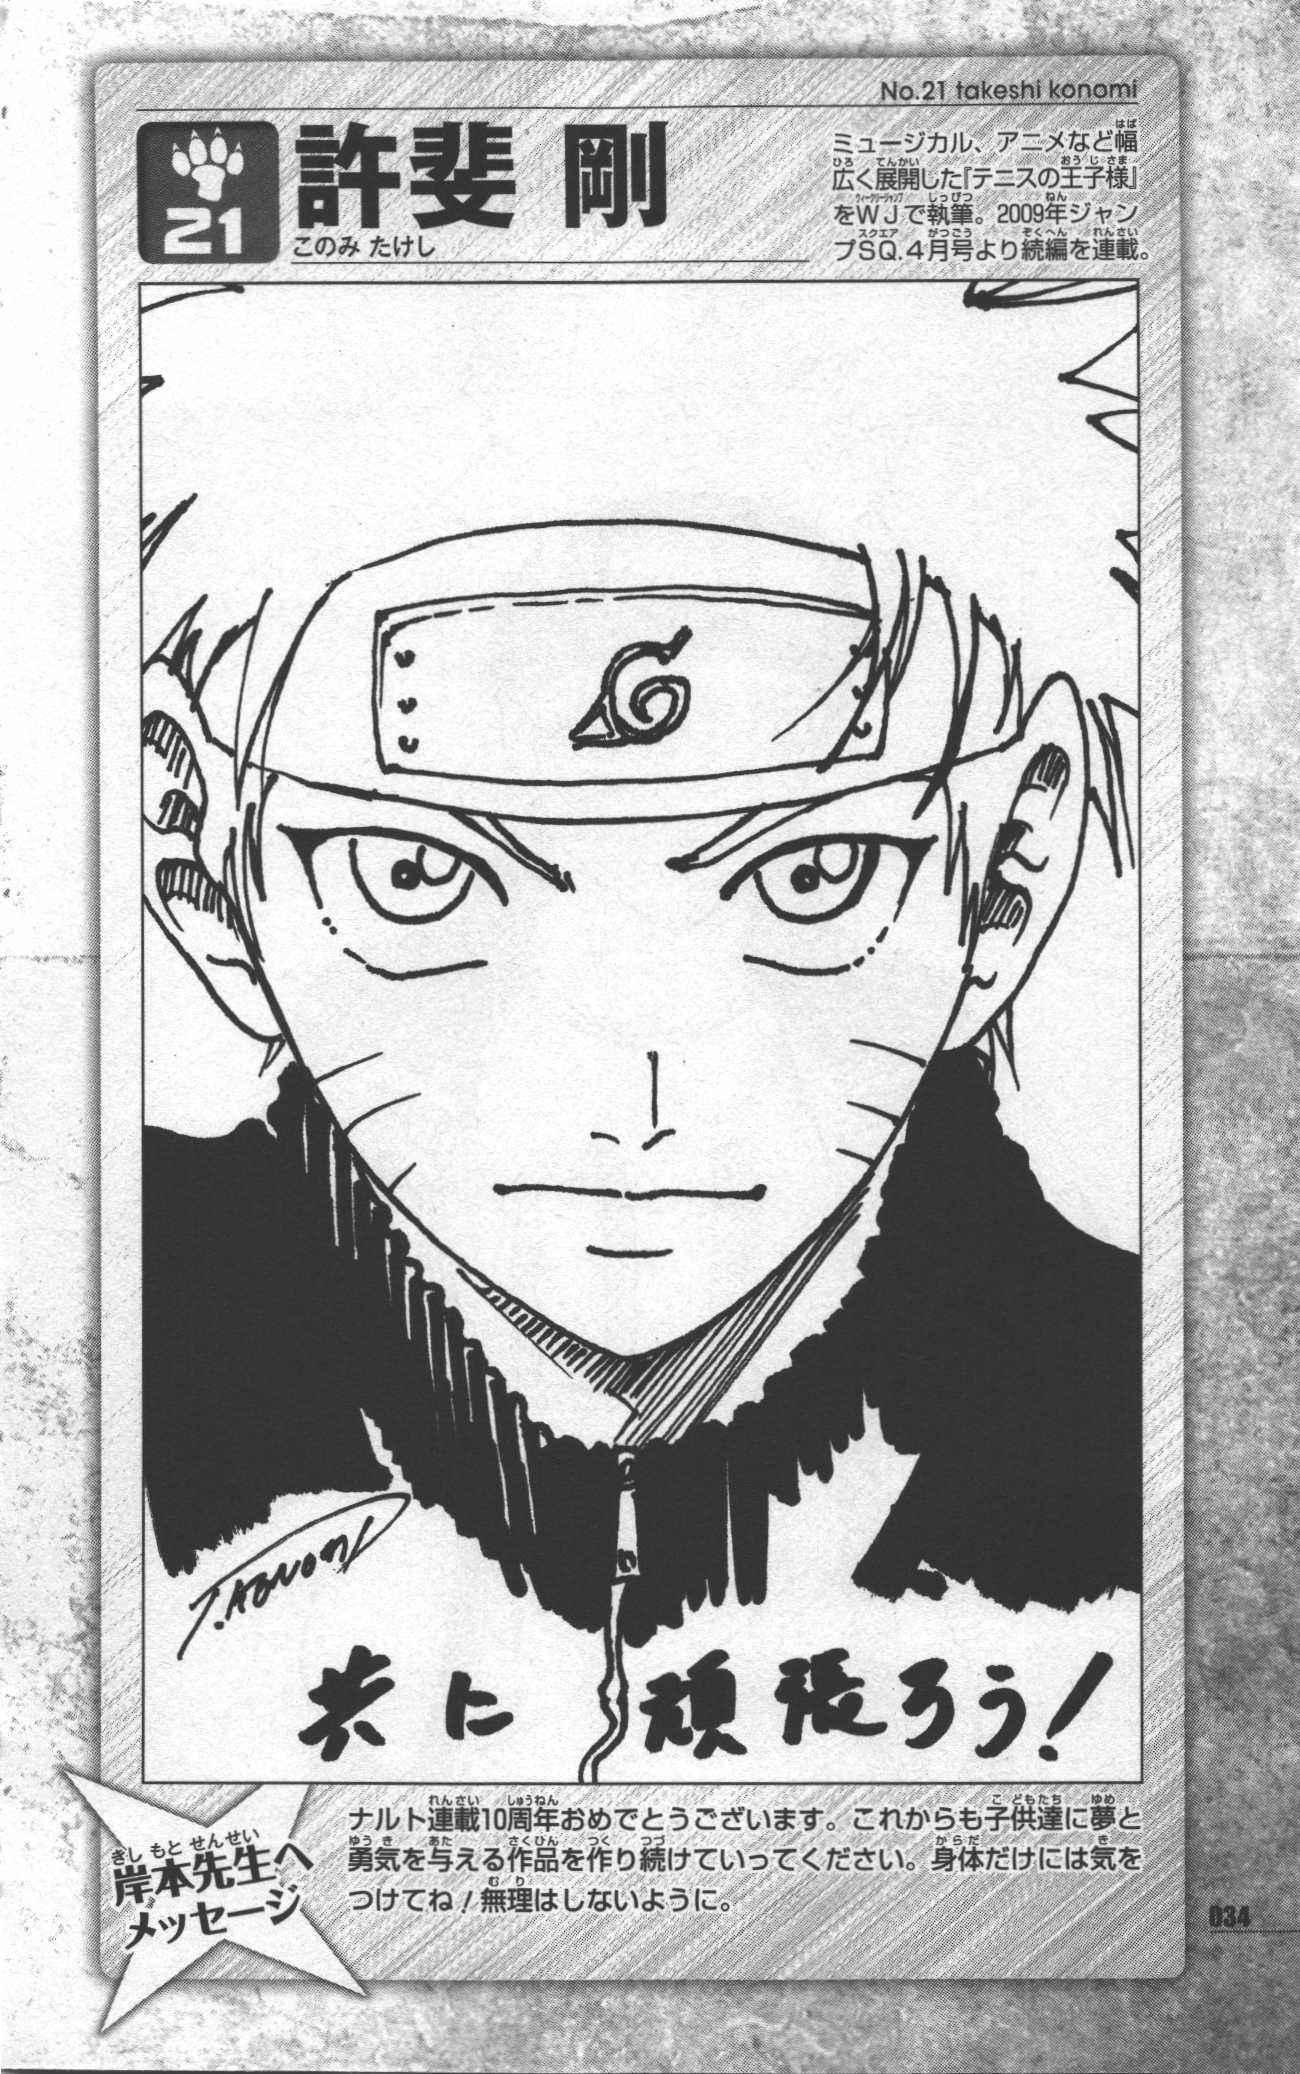 Drawn naruto different style By Takeshi (Tennis no Naruto